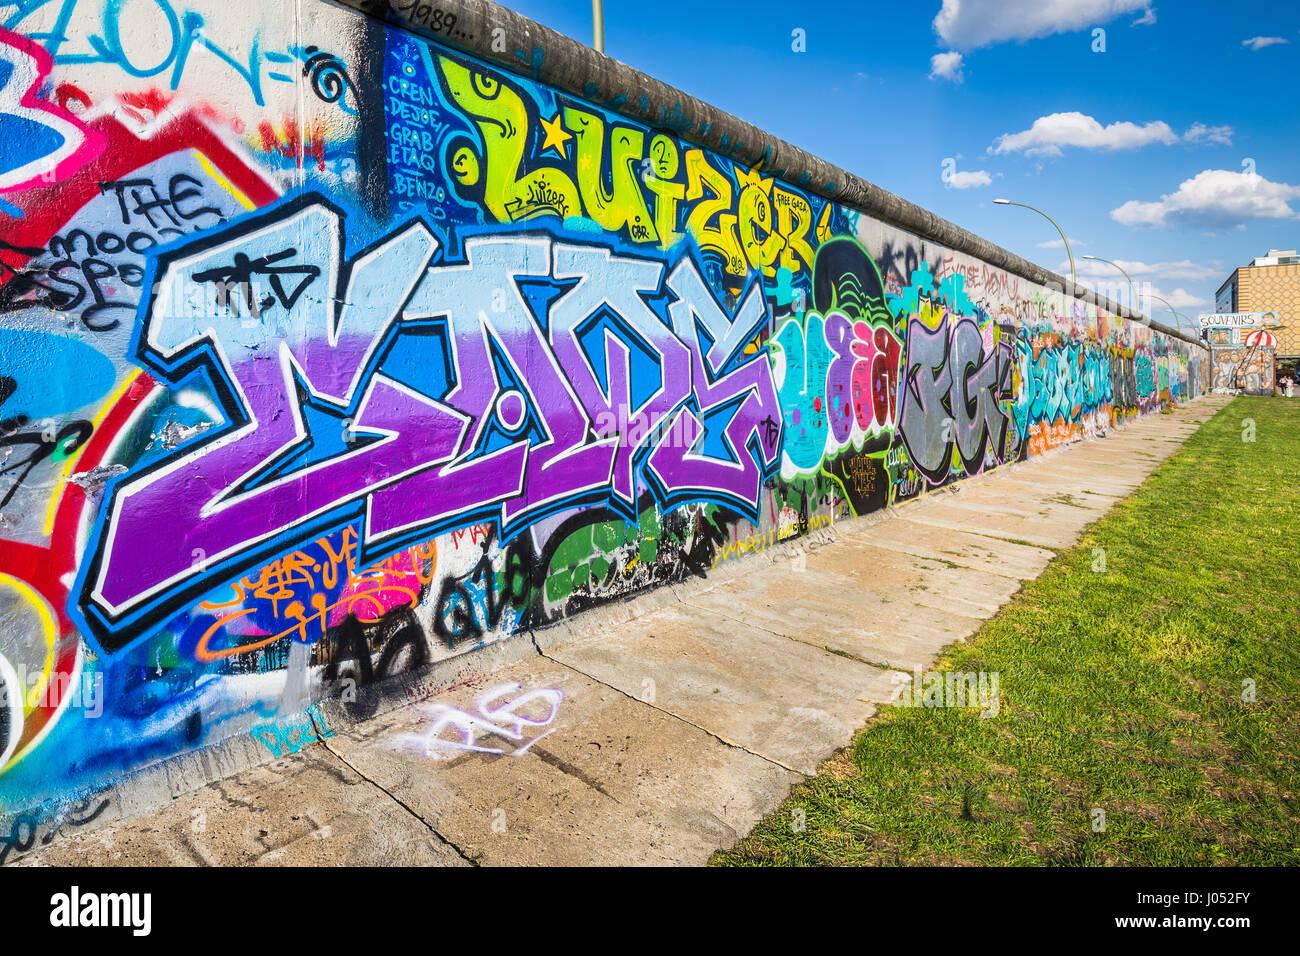 Panoramablick auf der berühmten Berliner Mauer dekoriert mit bunten Graffiti Streetart in historischen East Stockbild